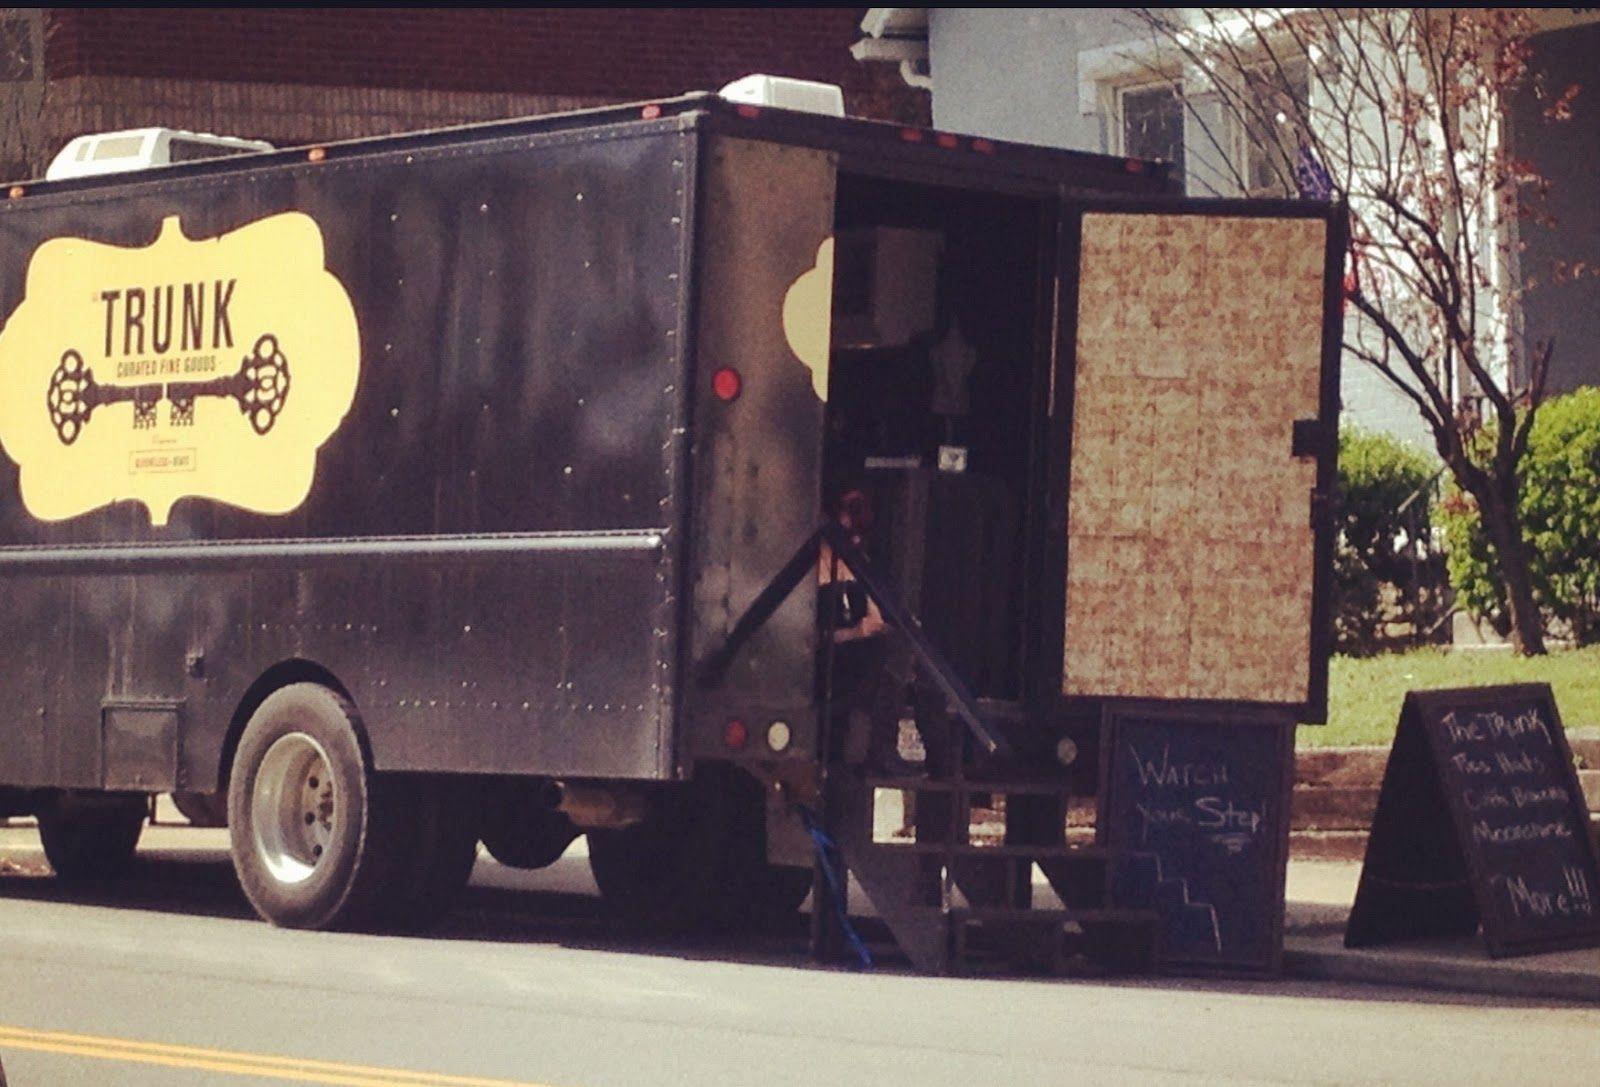 The Trunk Nashville Music row, Trunks, Fashion truck